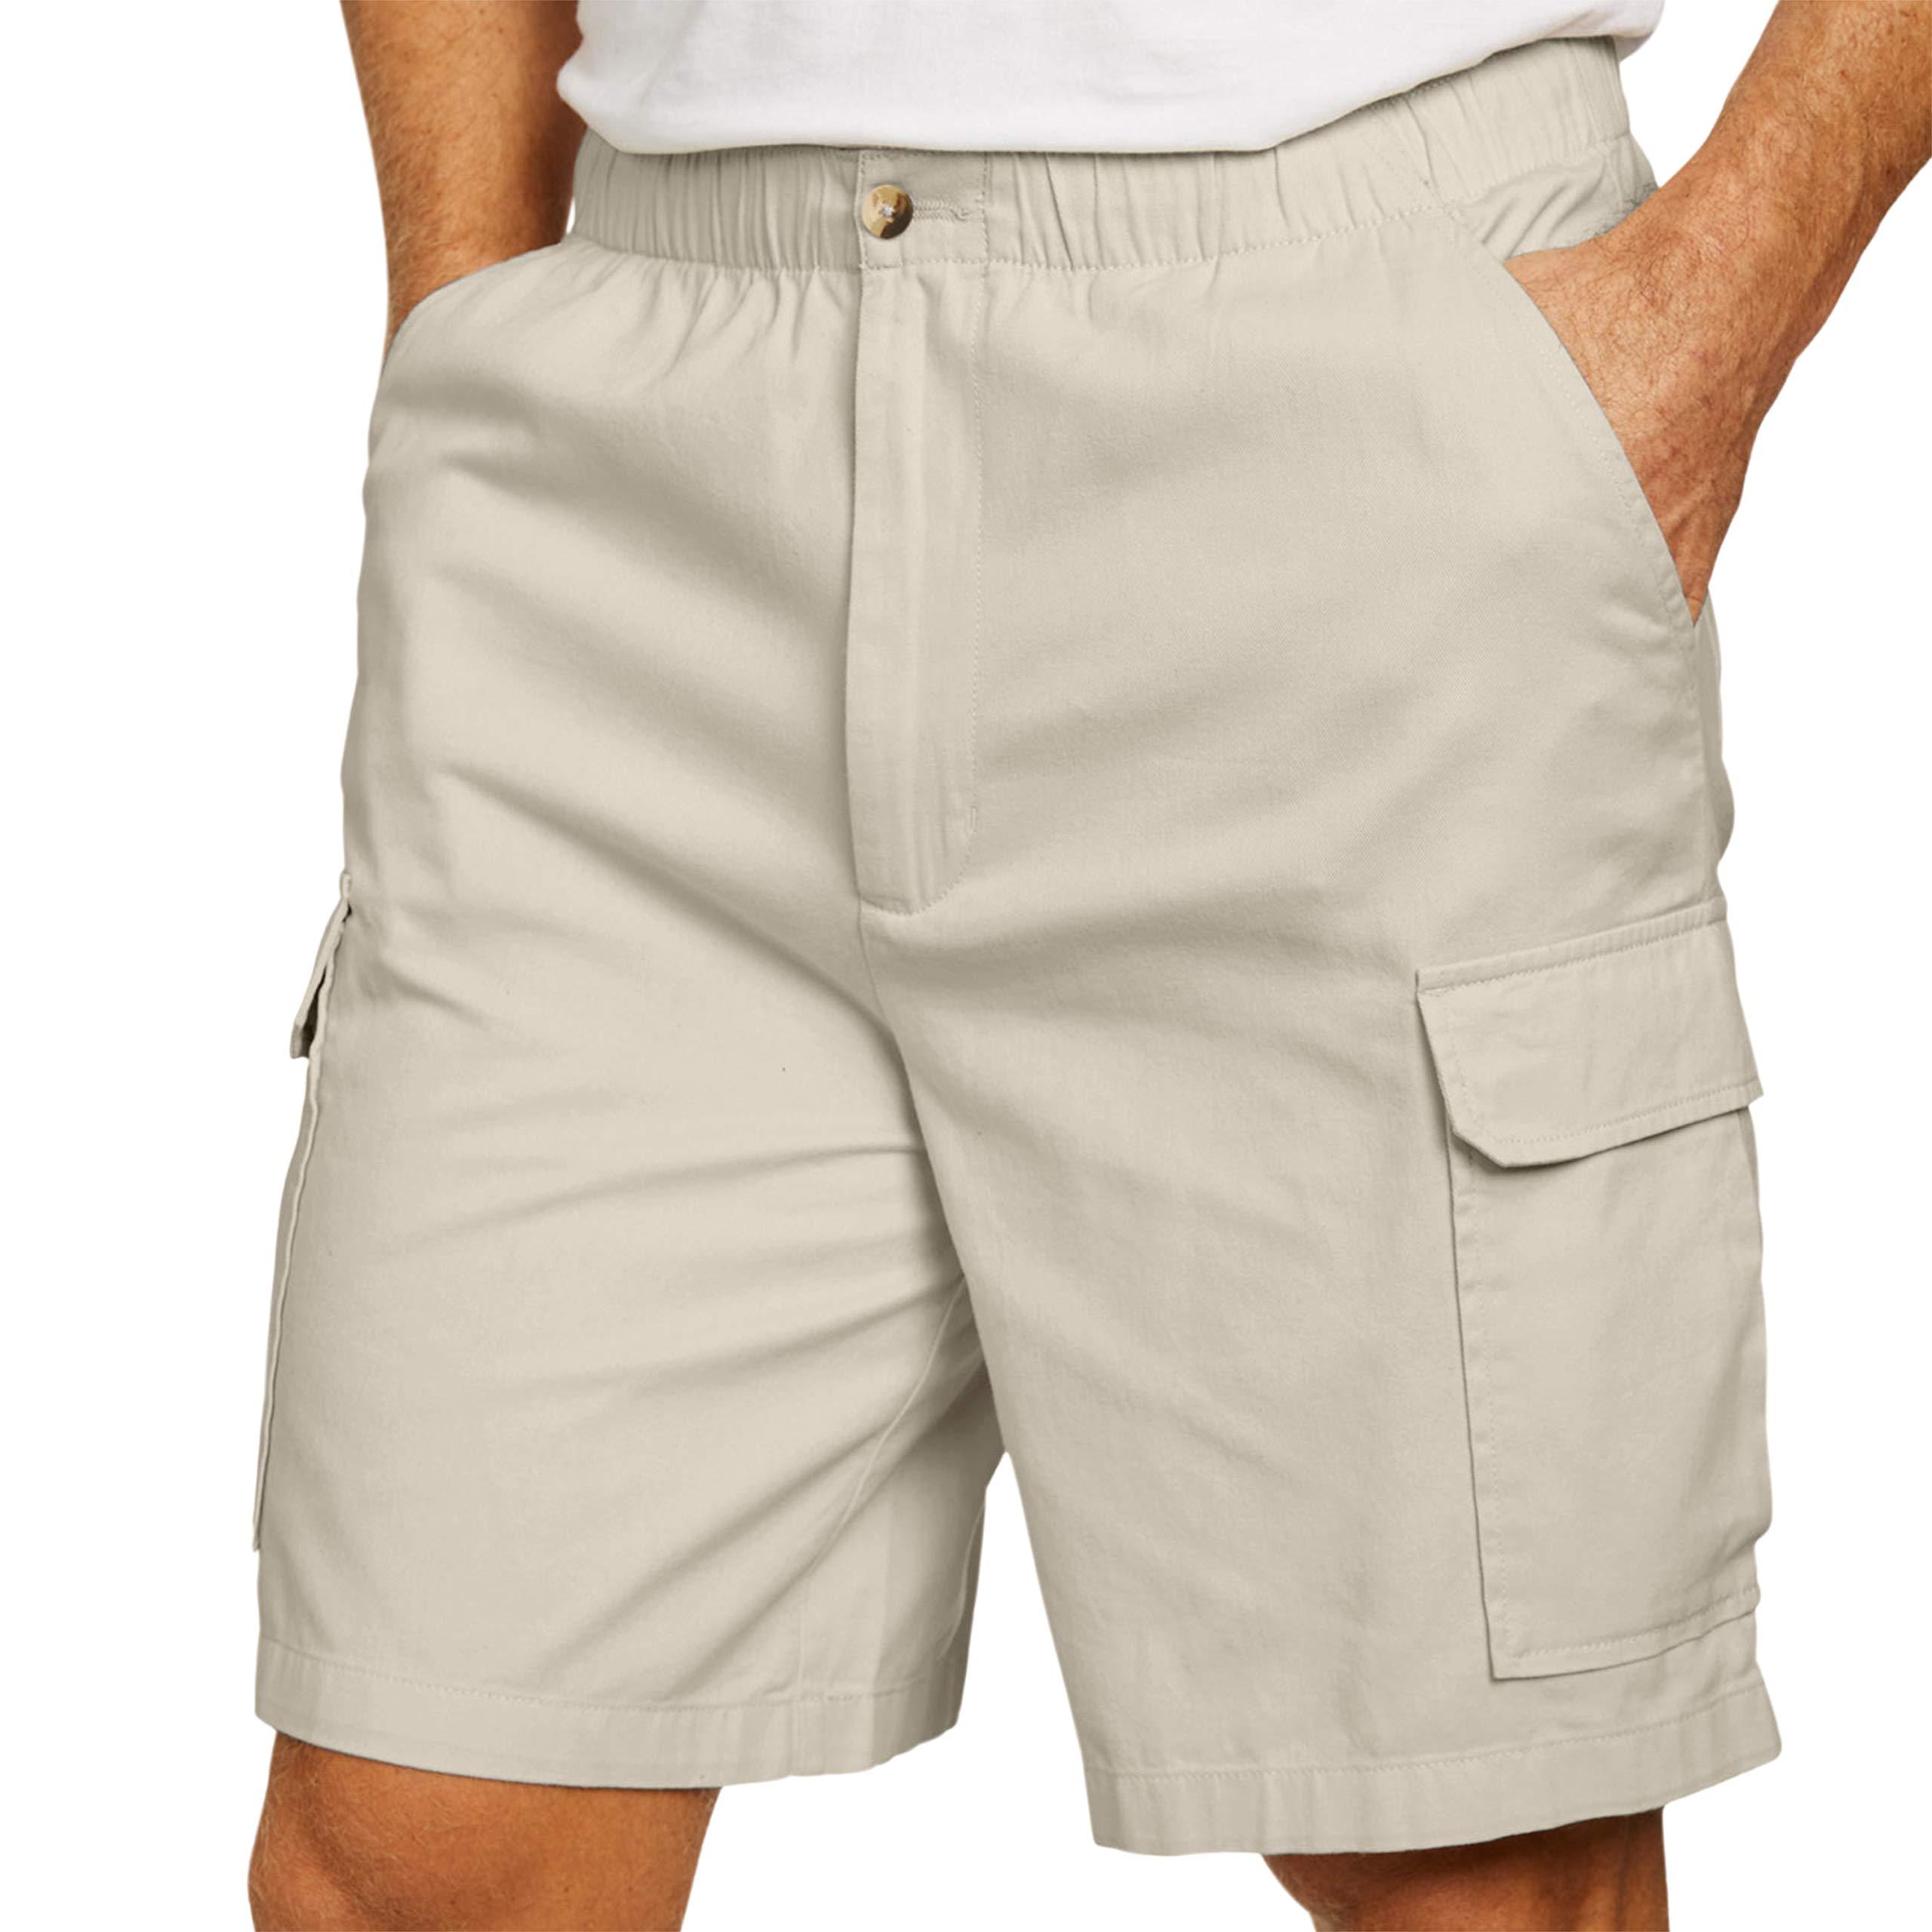 KingSize Men's Big & Tall Knockarounds 8'' Cargo Shorts, Stone Big-4XL